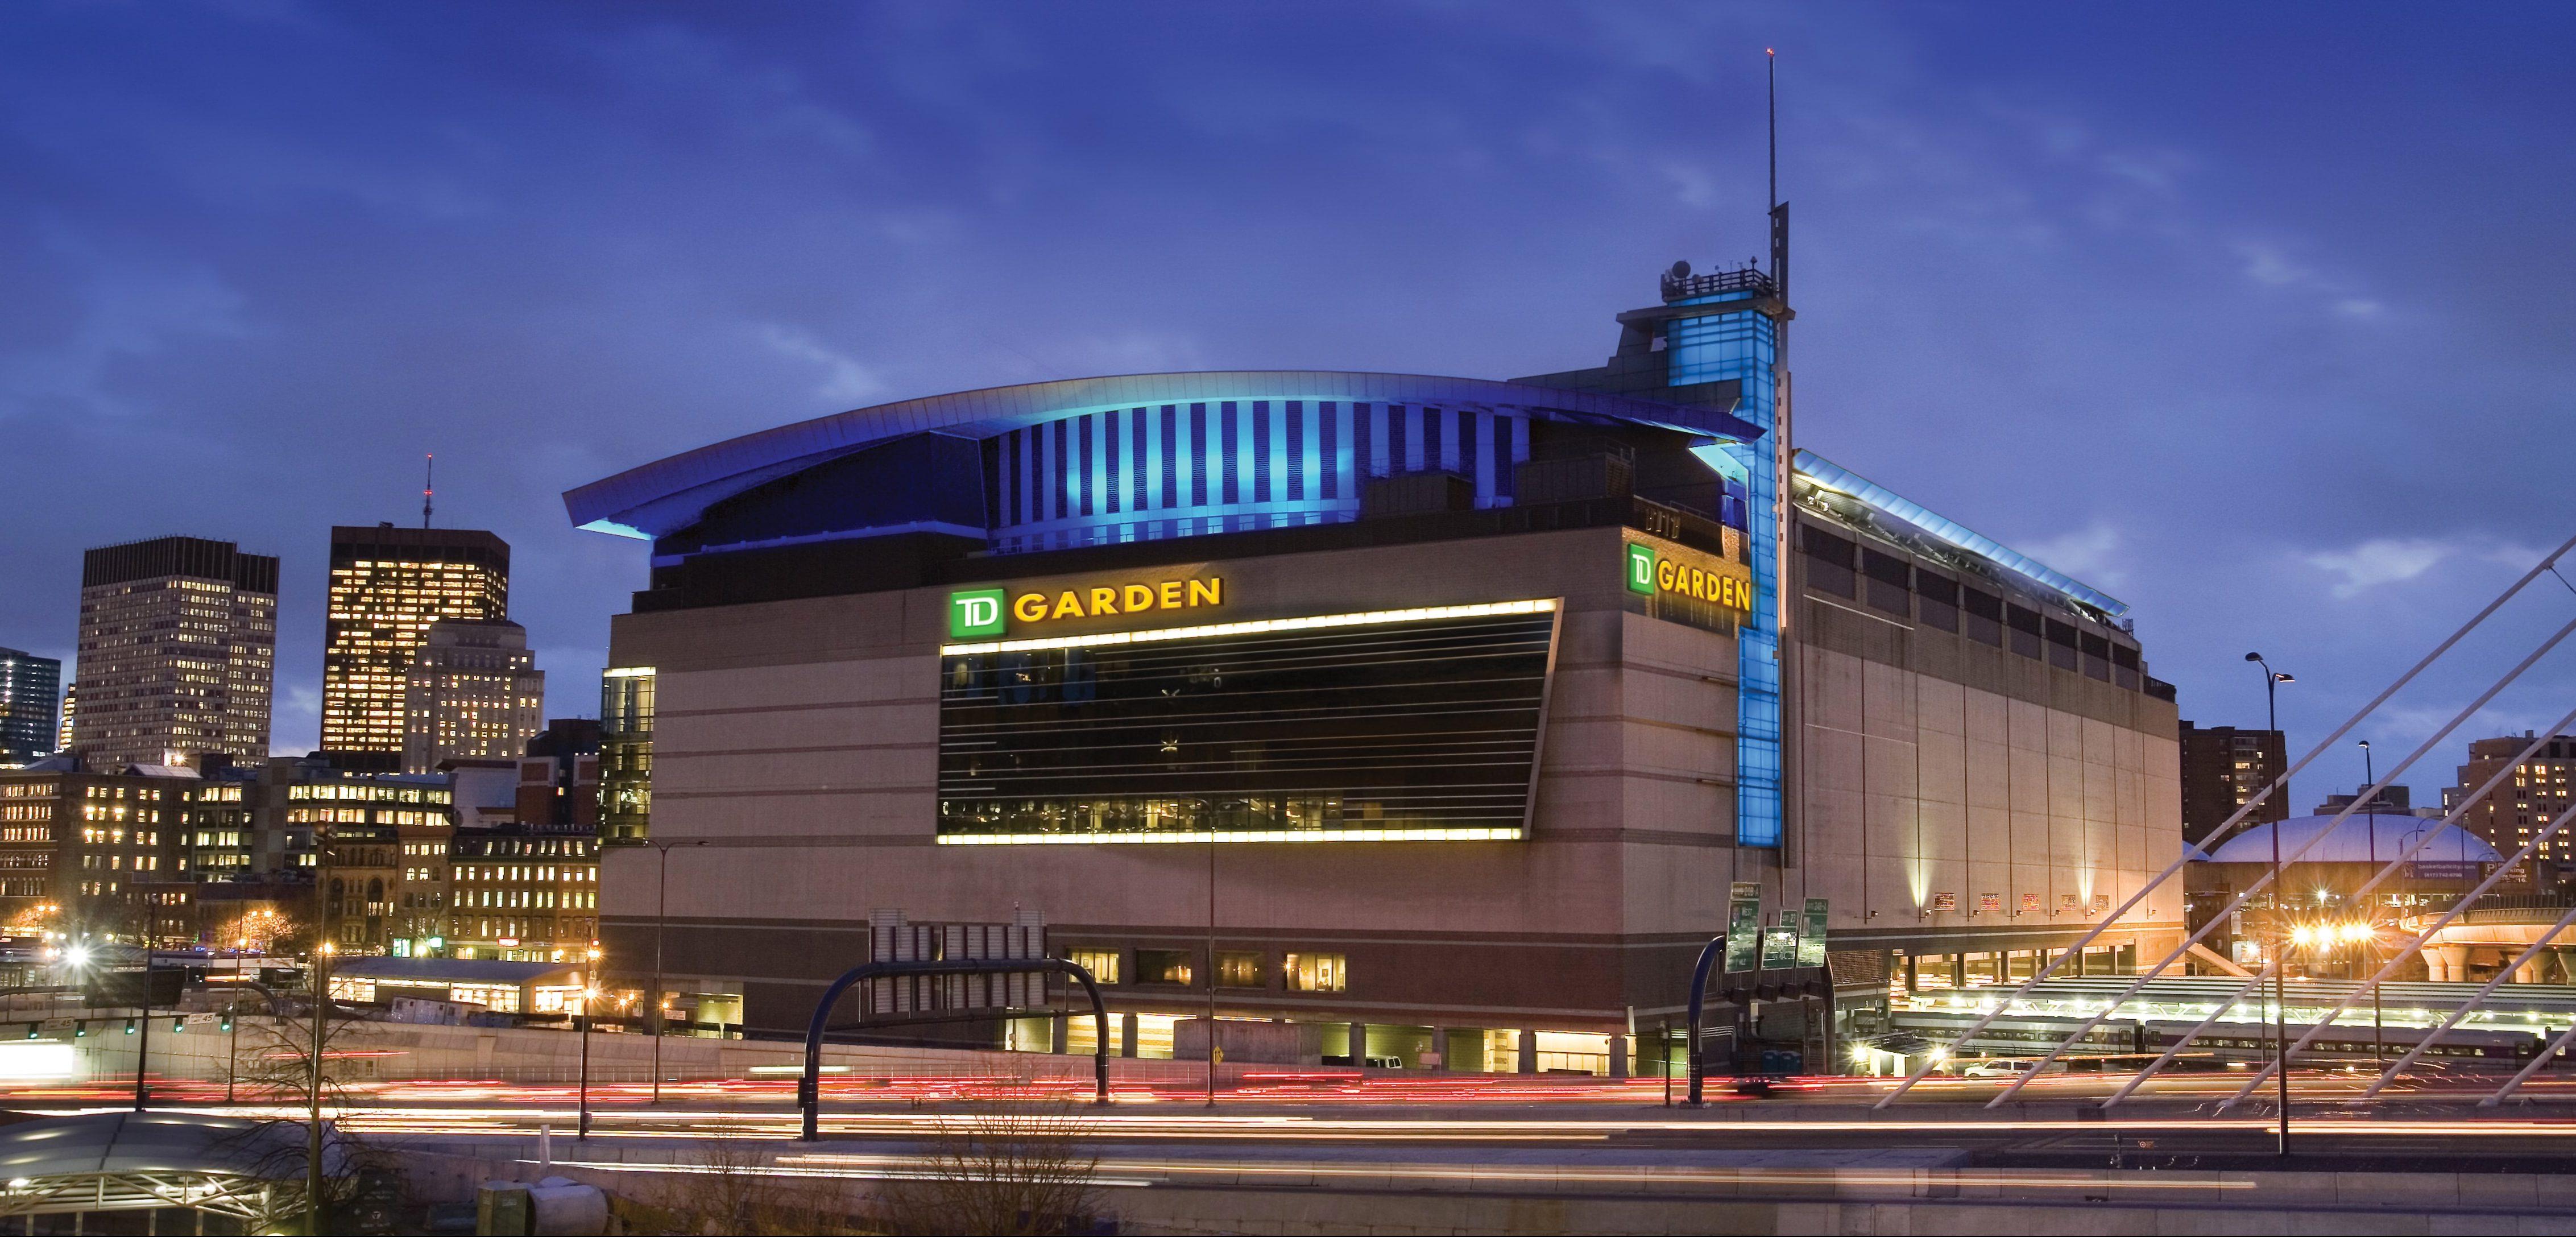 Step Inside Td Garden In Boston Ticketmaster Blog